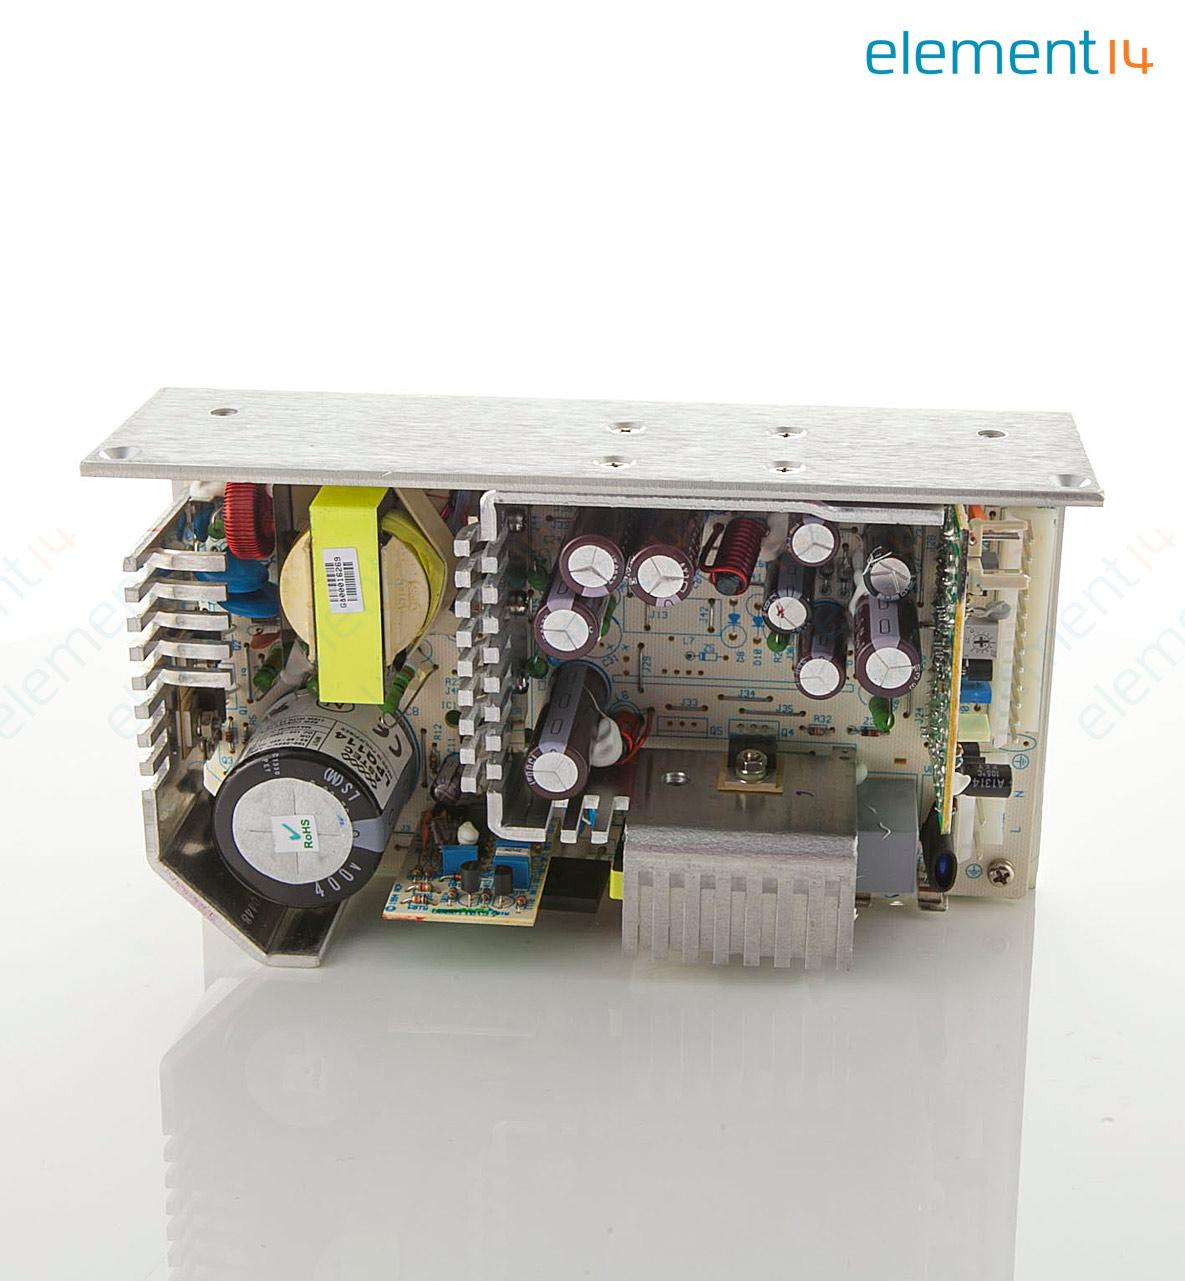 LPQ114-B ARTESYN EMBEDDED TECHNOLOGIES, Fuente de Alimentación AC/DC ...